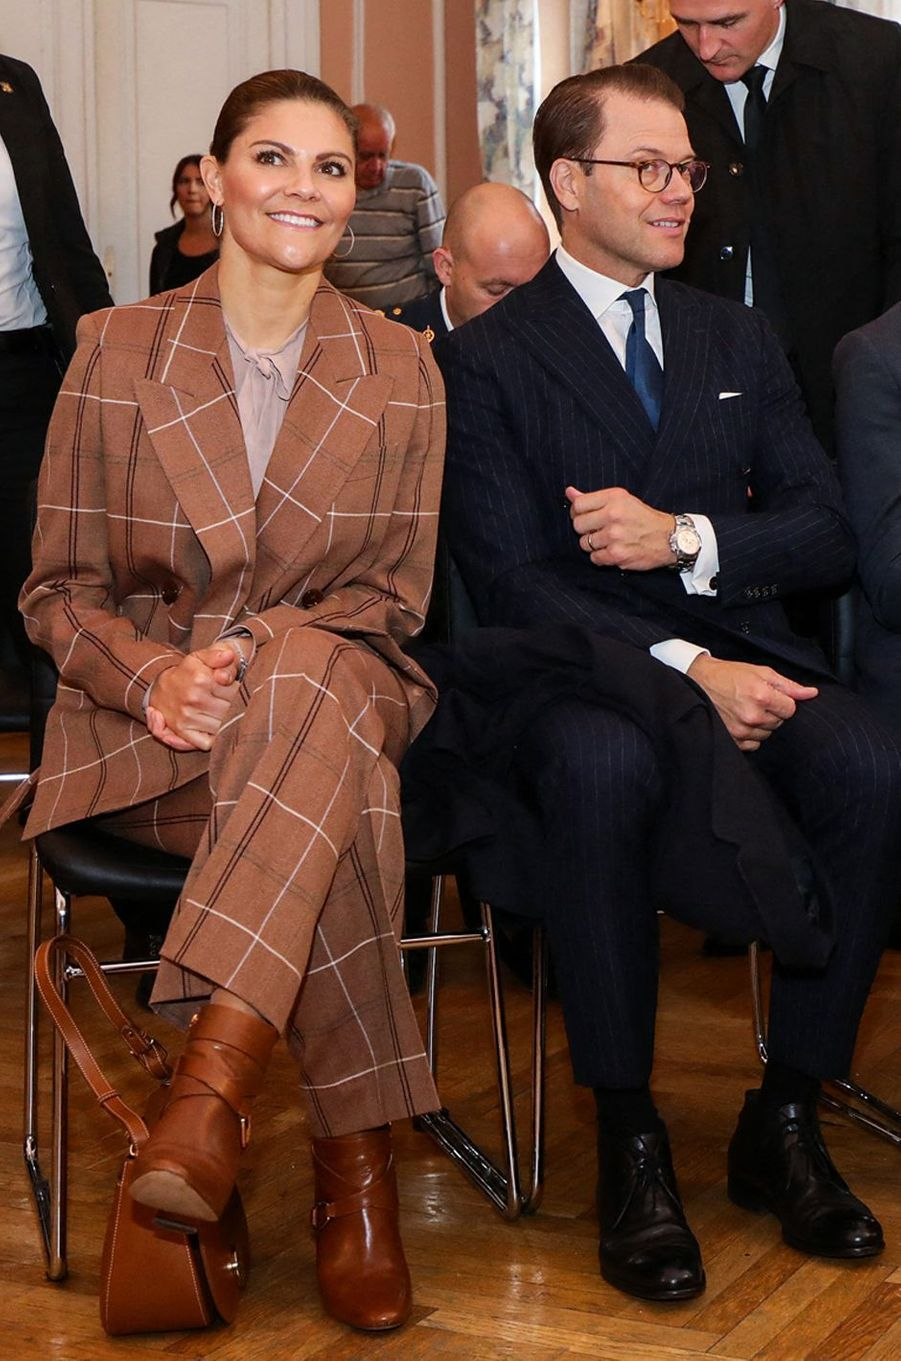 La princesse Victoria de Suède en Bosnie-Herzégovine, le 7 novembre 2019